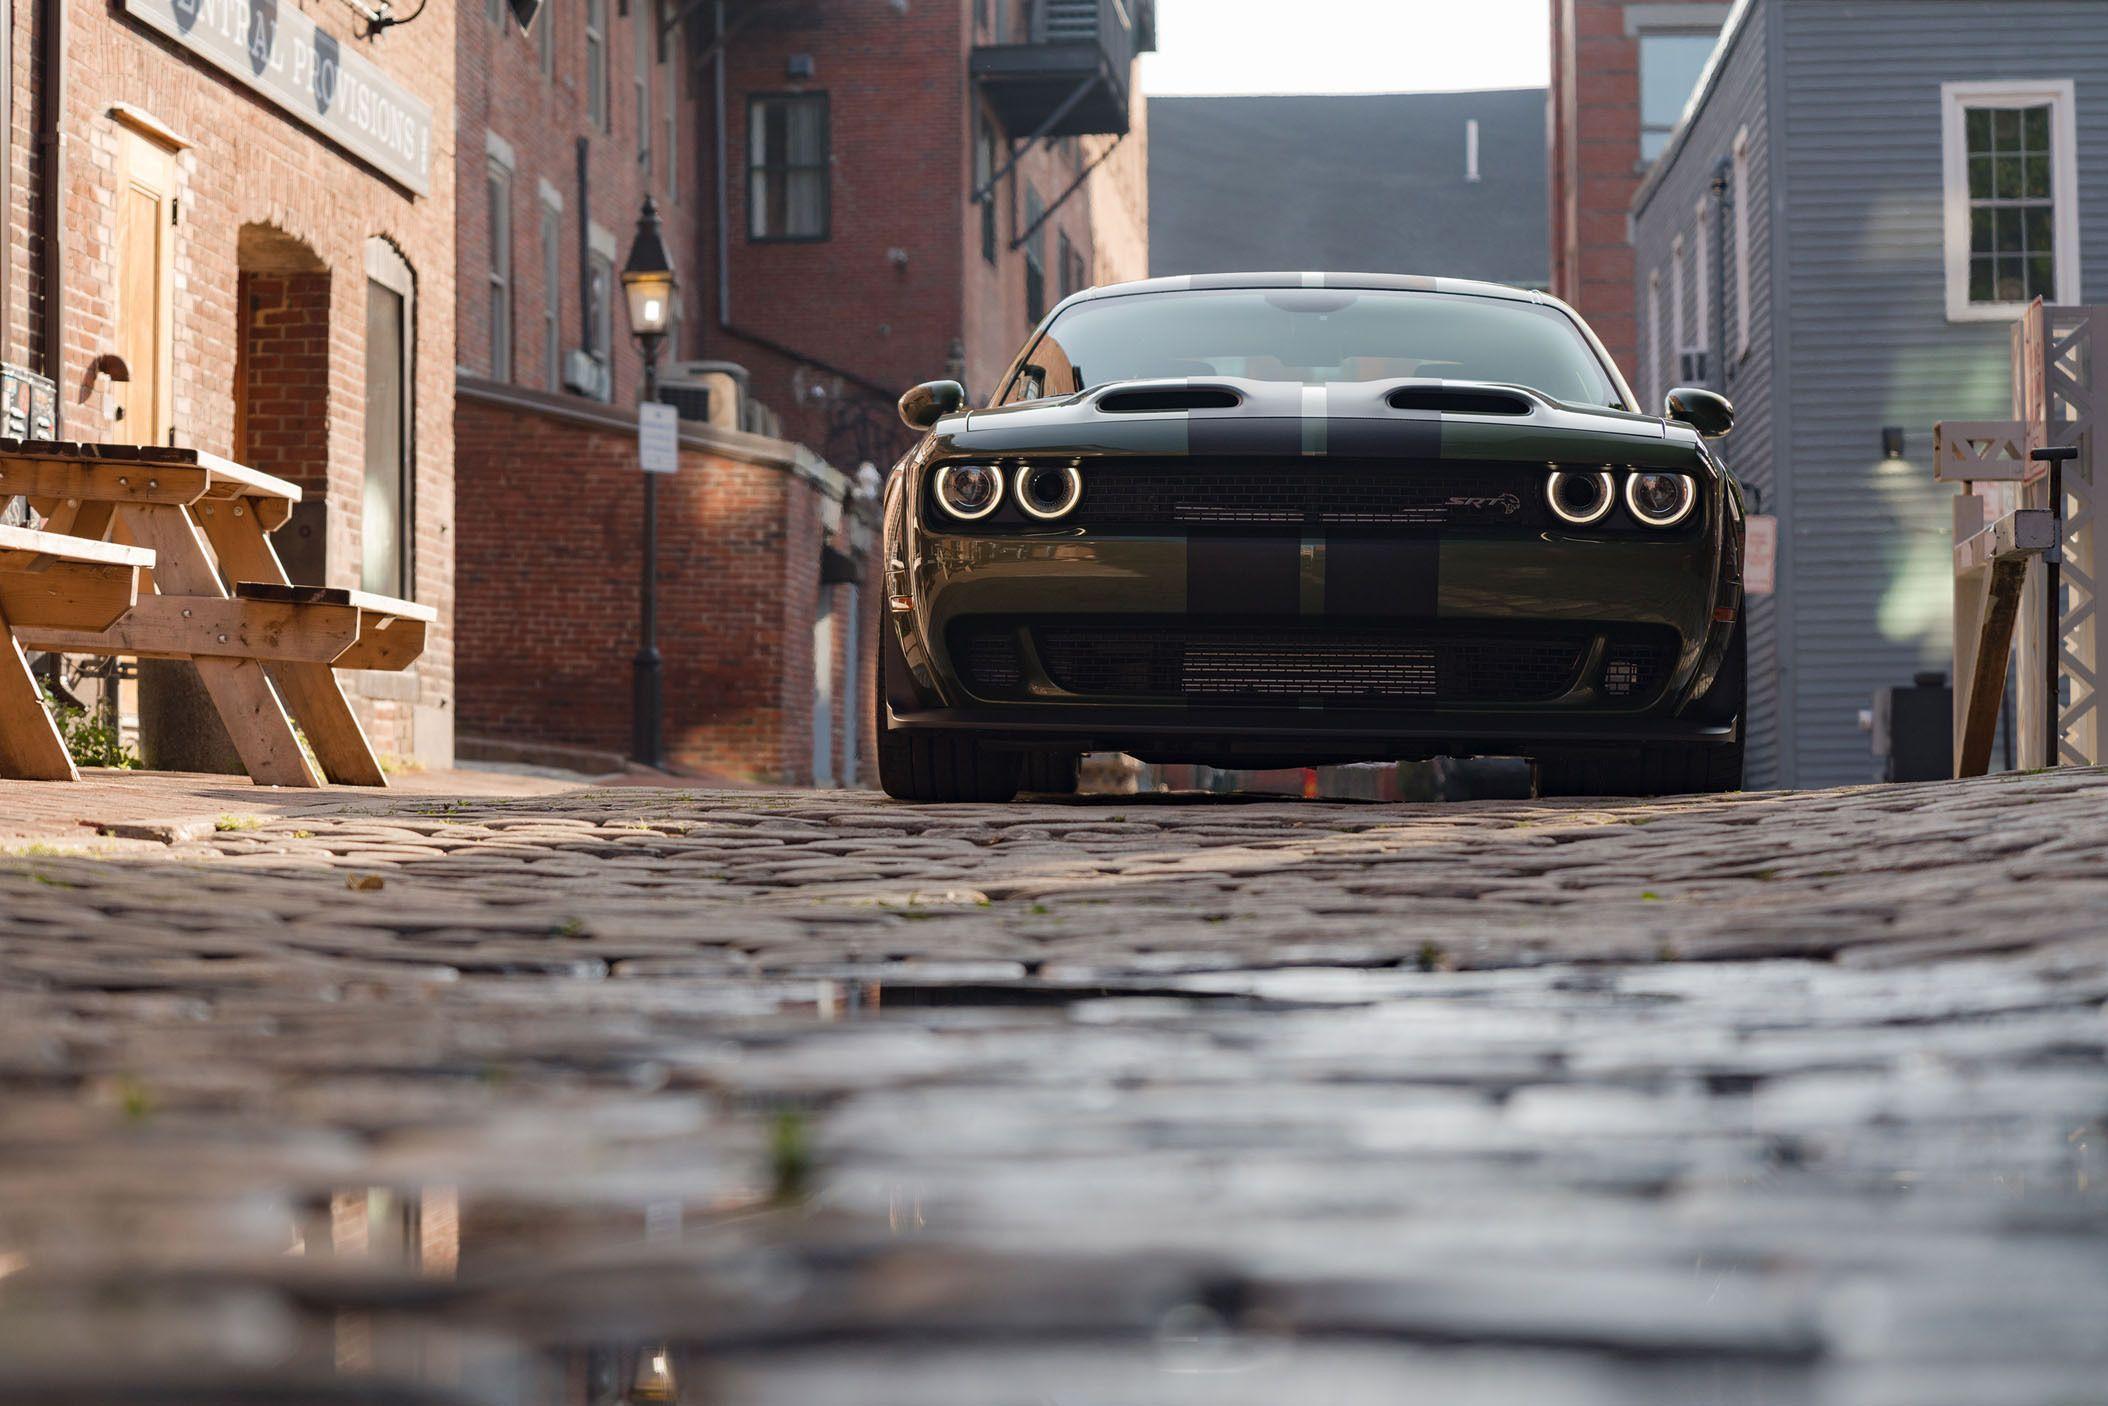 2019 Dodge Challenger Srt Hellcat Redeye Driving Review Dodge Challenger Srt Hellcat Challenger Srt Hellcat Dodge Challenger